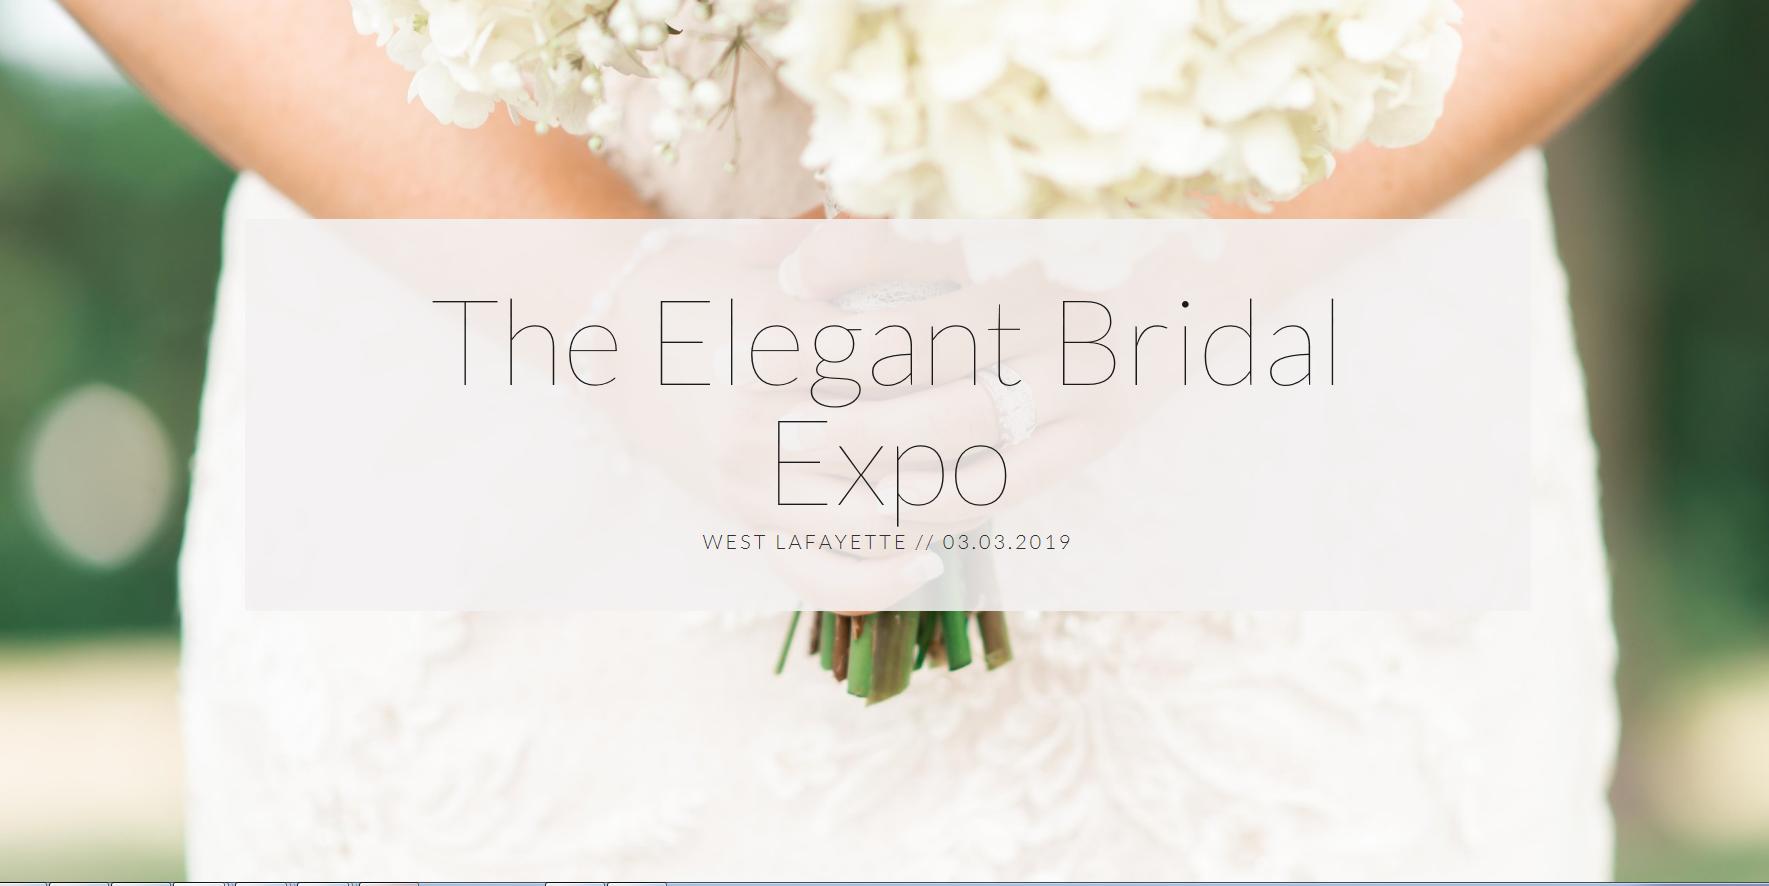 The Elegance Bridal Expo